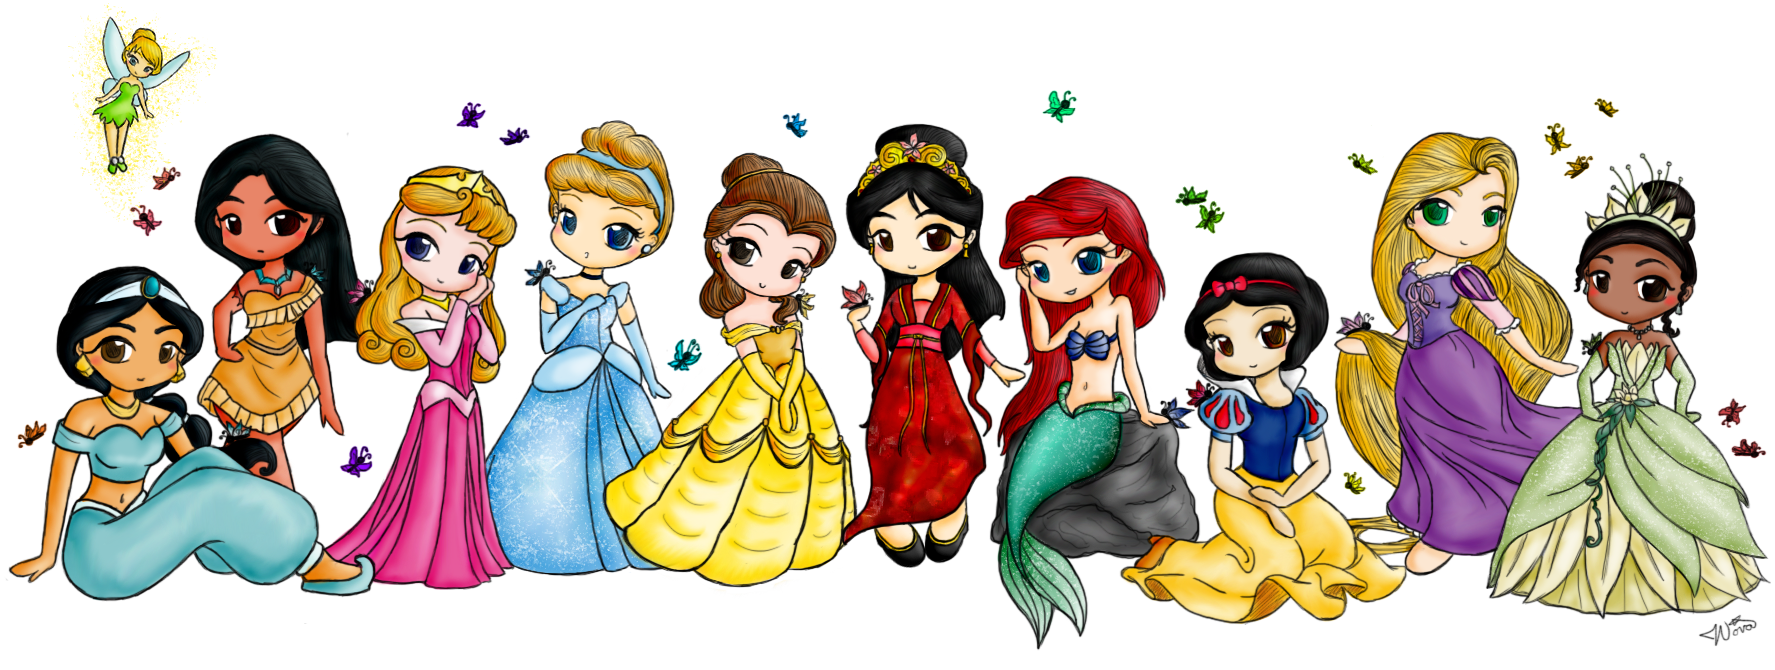 403 Forbidden Disney Princess Drawings Chibi Disney Princess Drawings